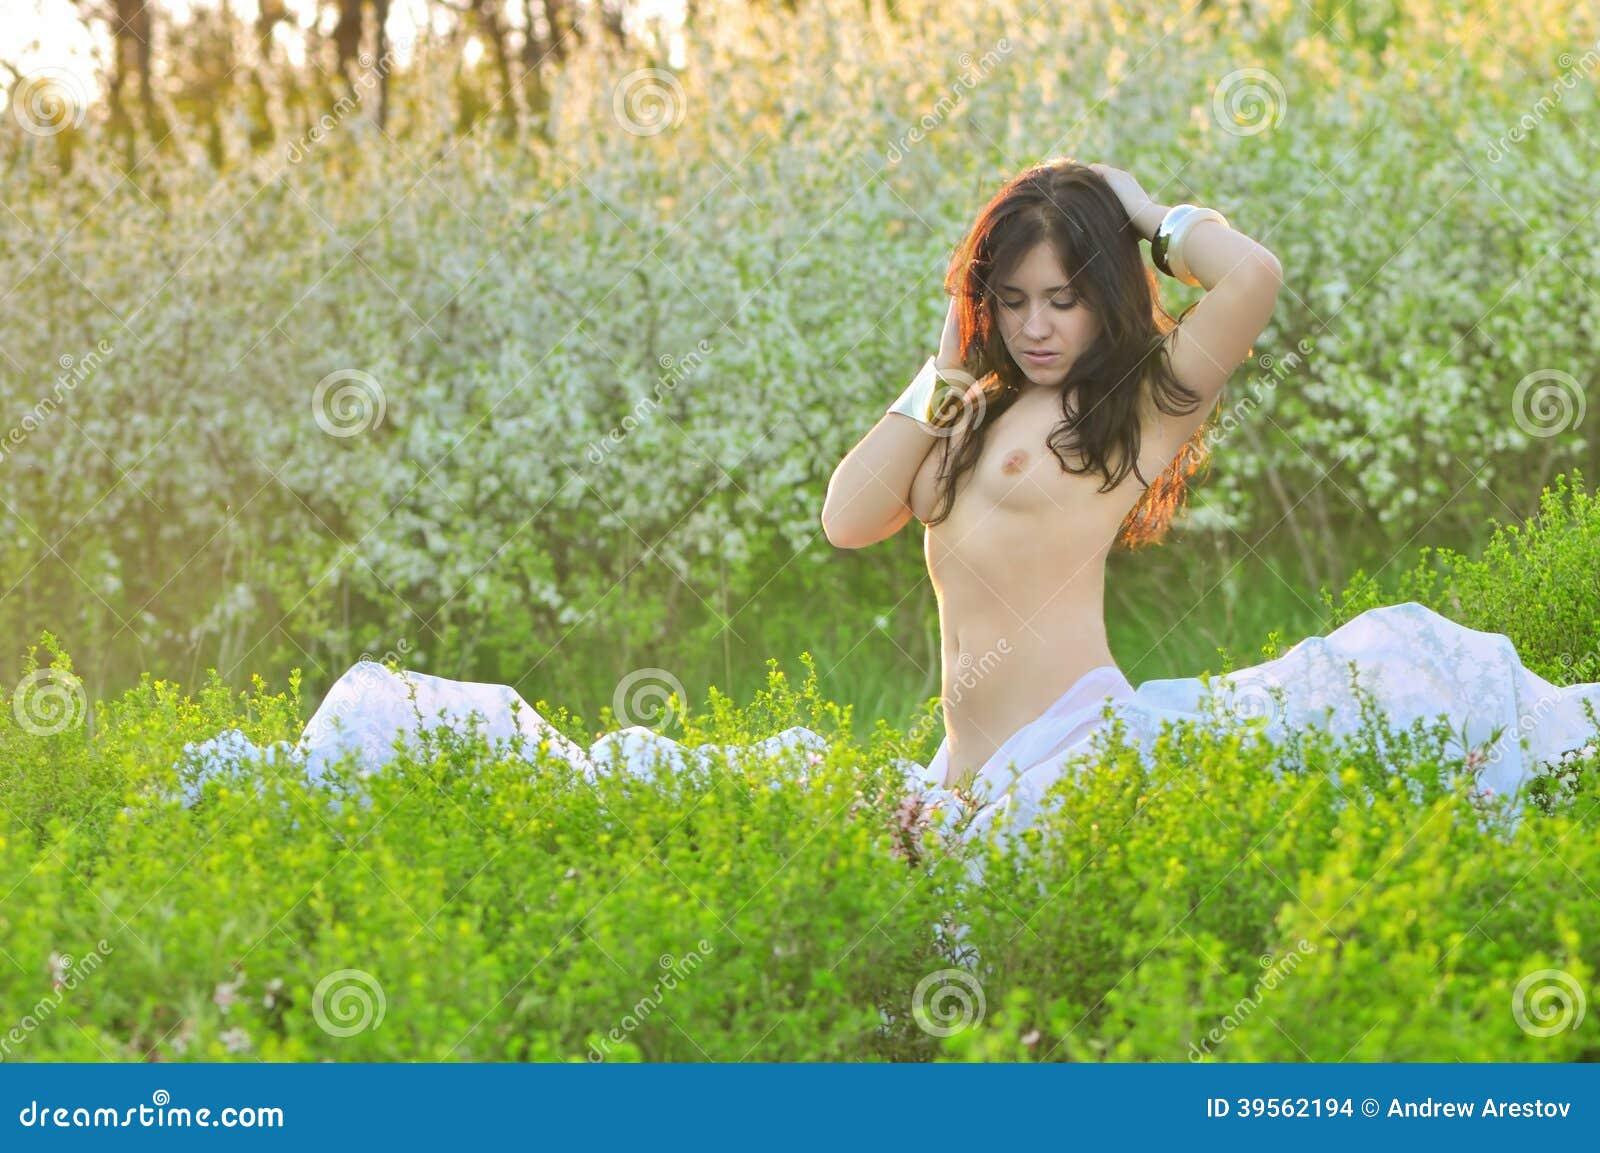 nude-girls-garden-young-kris-kardashian-nude-naked